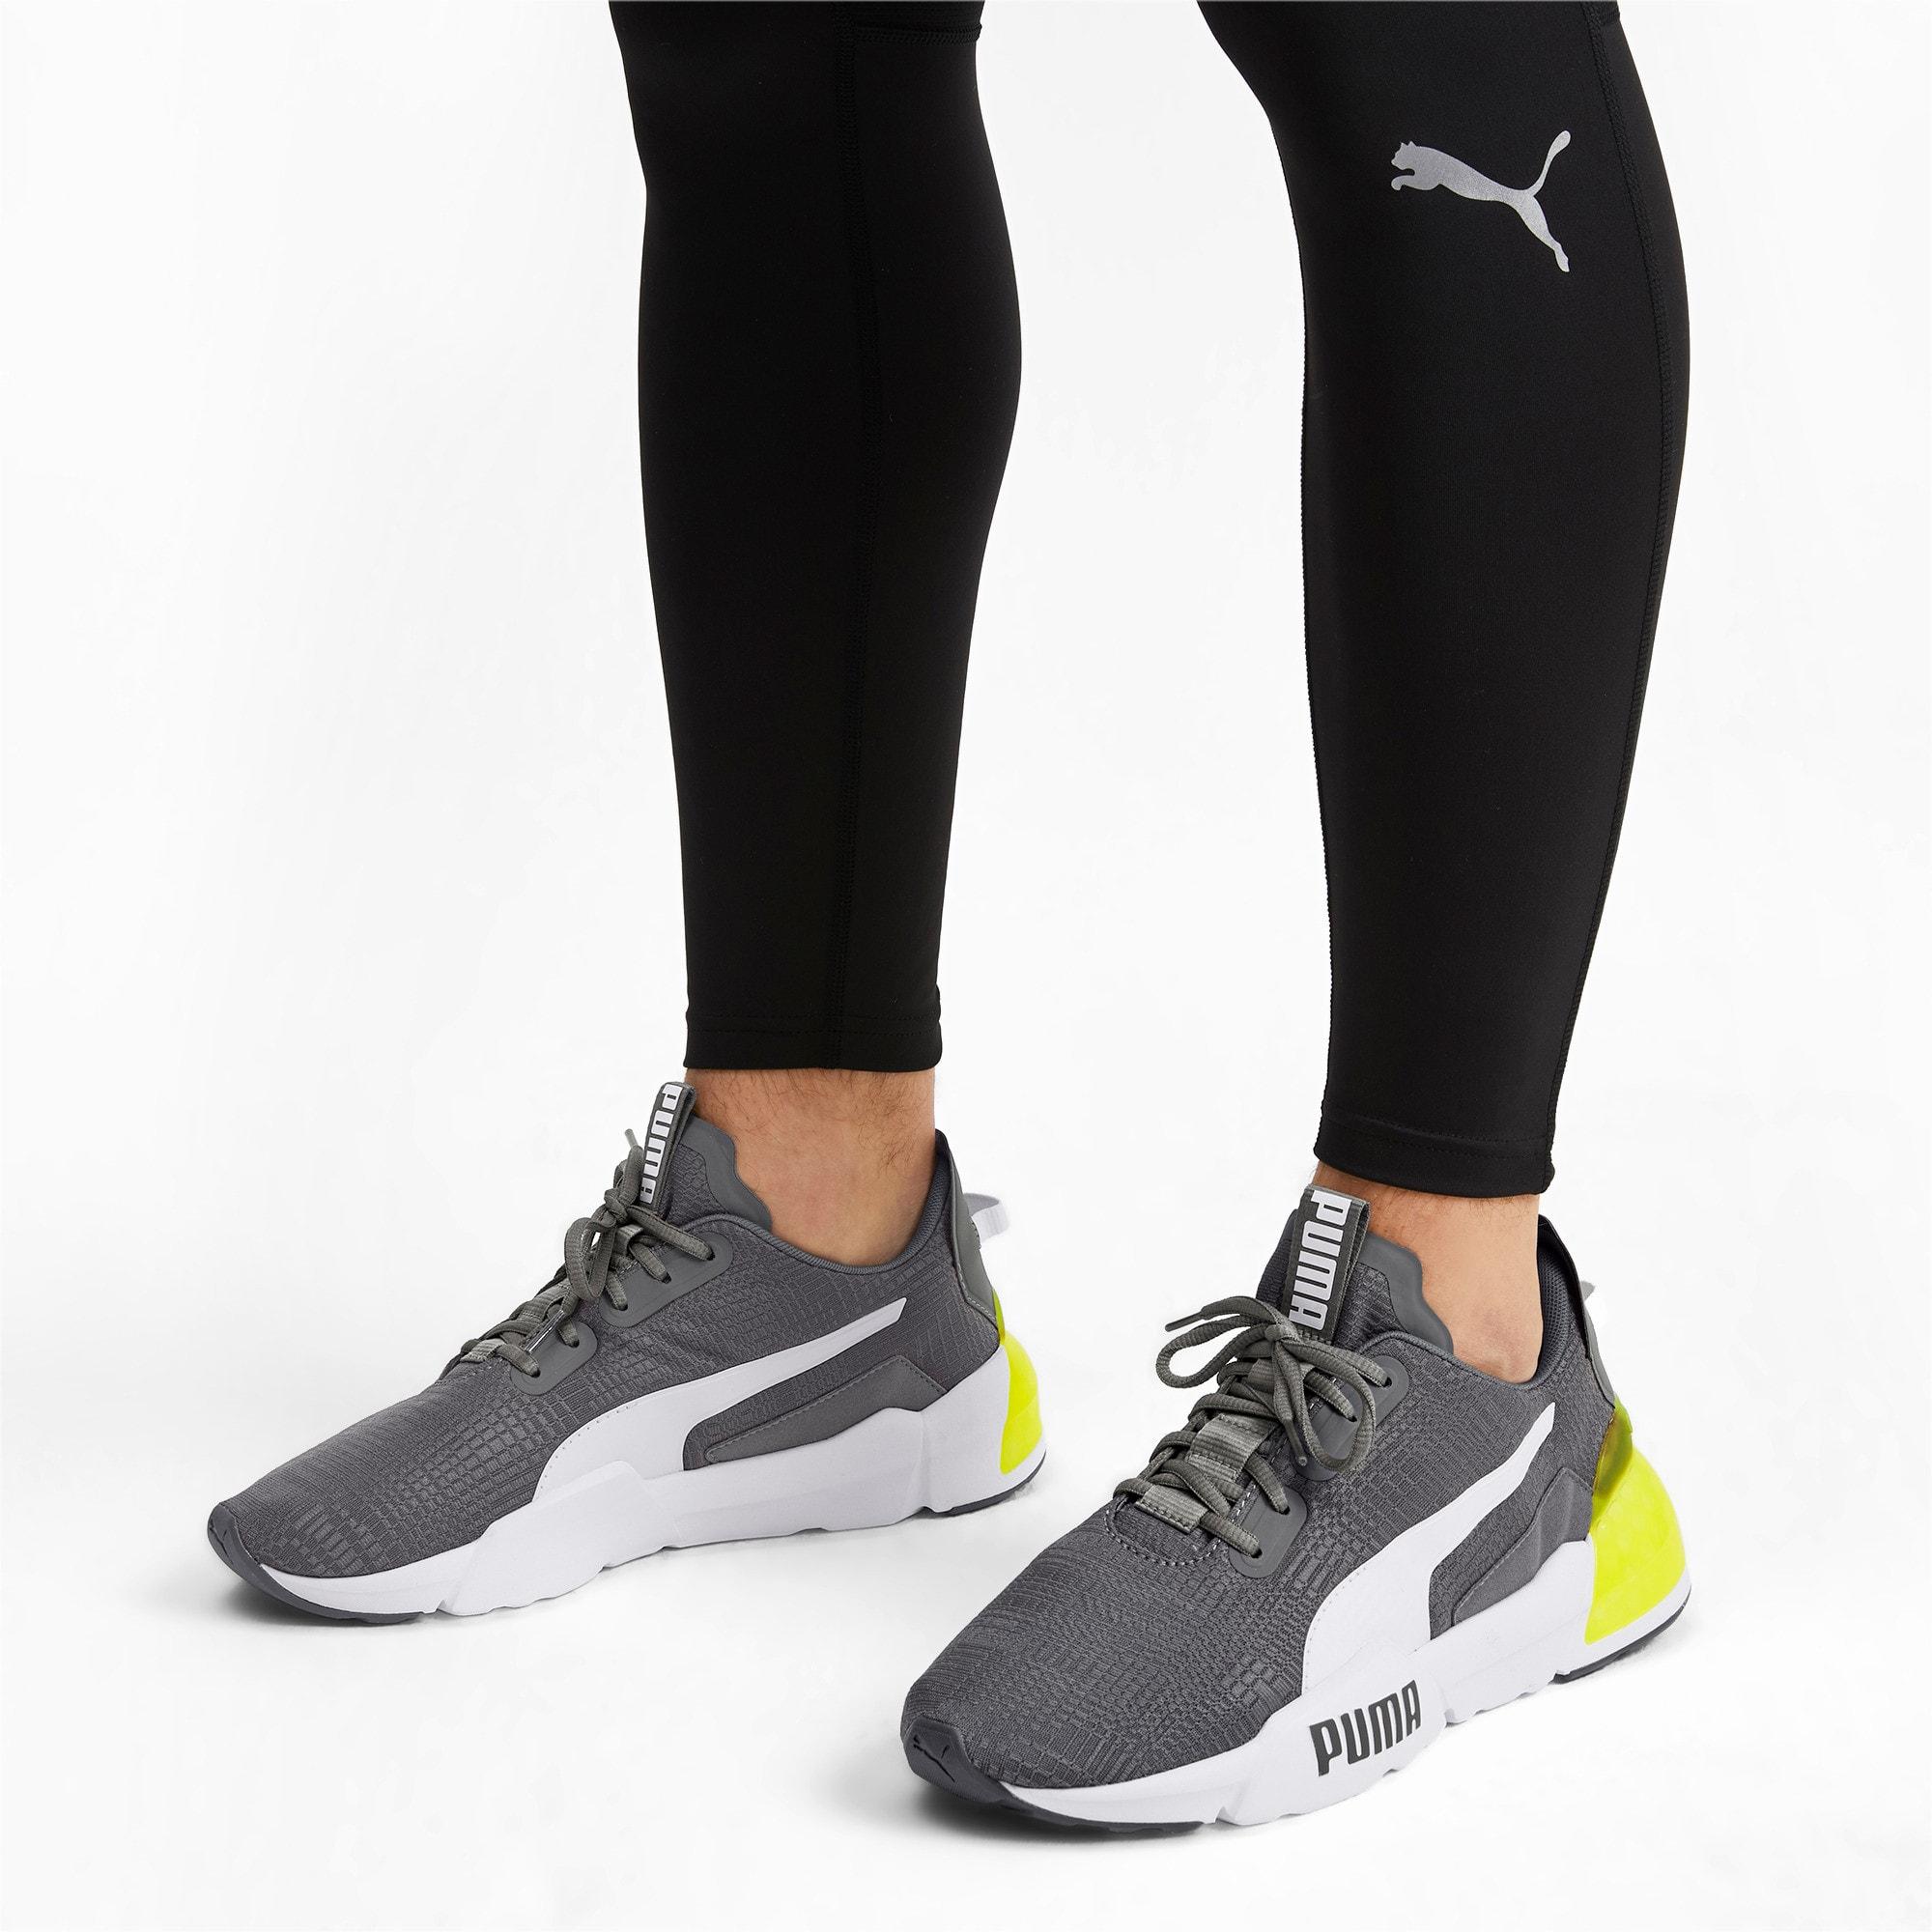 Thumbnail 3 of CELL Phase Lights Men's Training Shoes, CASTLEROCK-Yellow Alert, medium